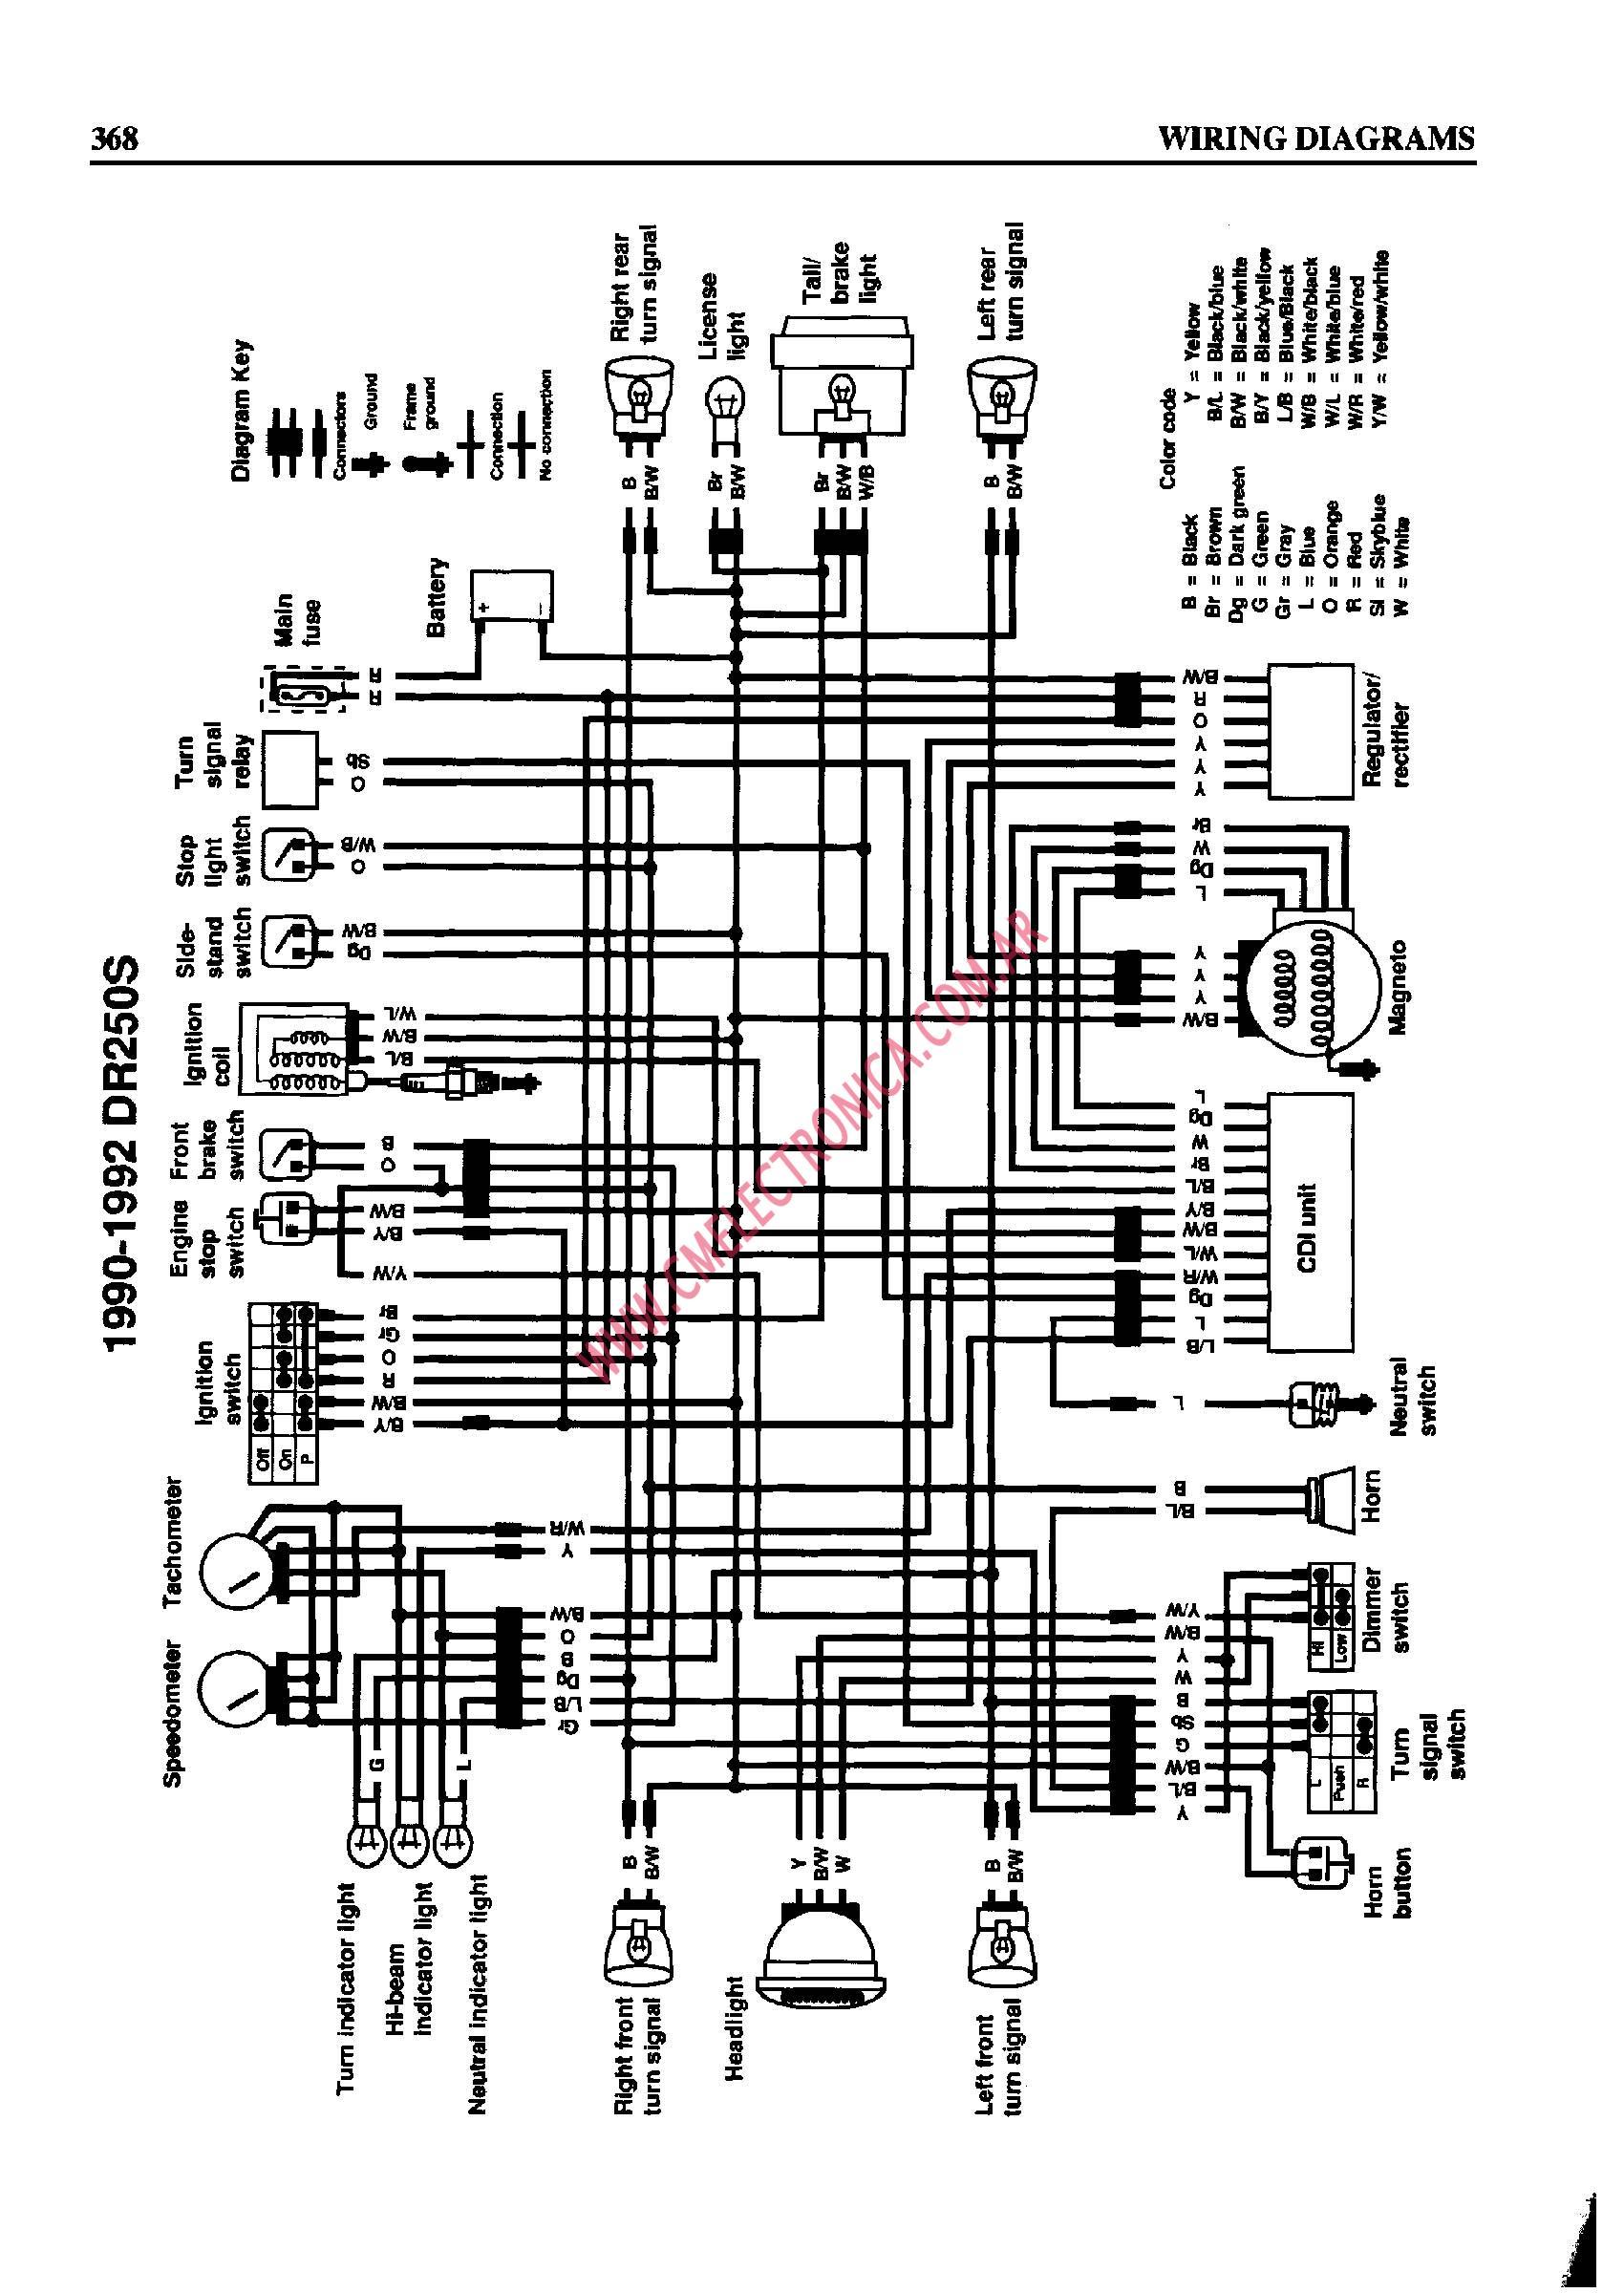 gn250 wiring diagram battery diagrams wiring diagram